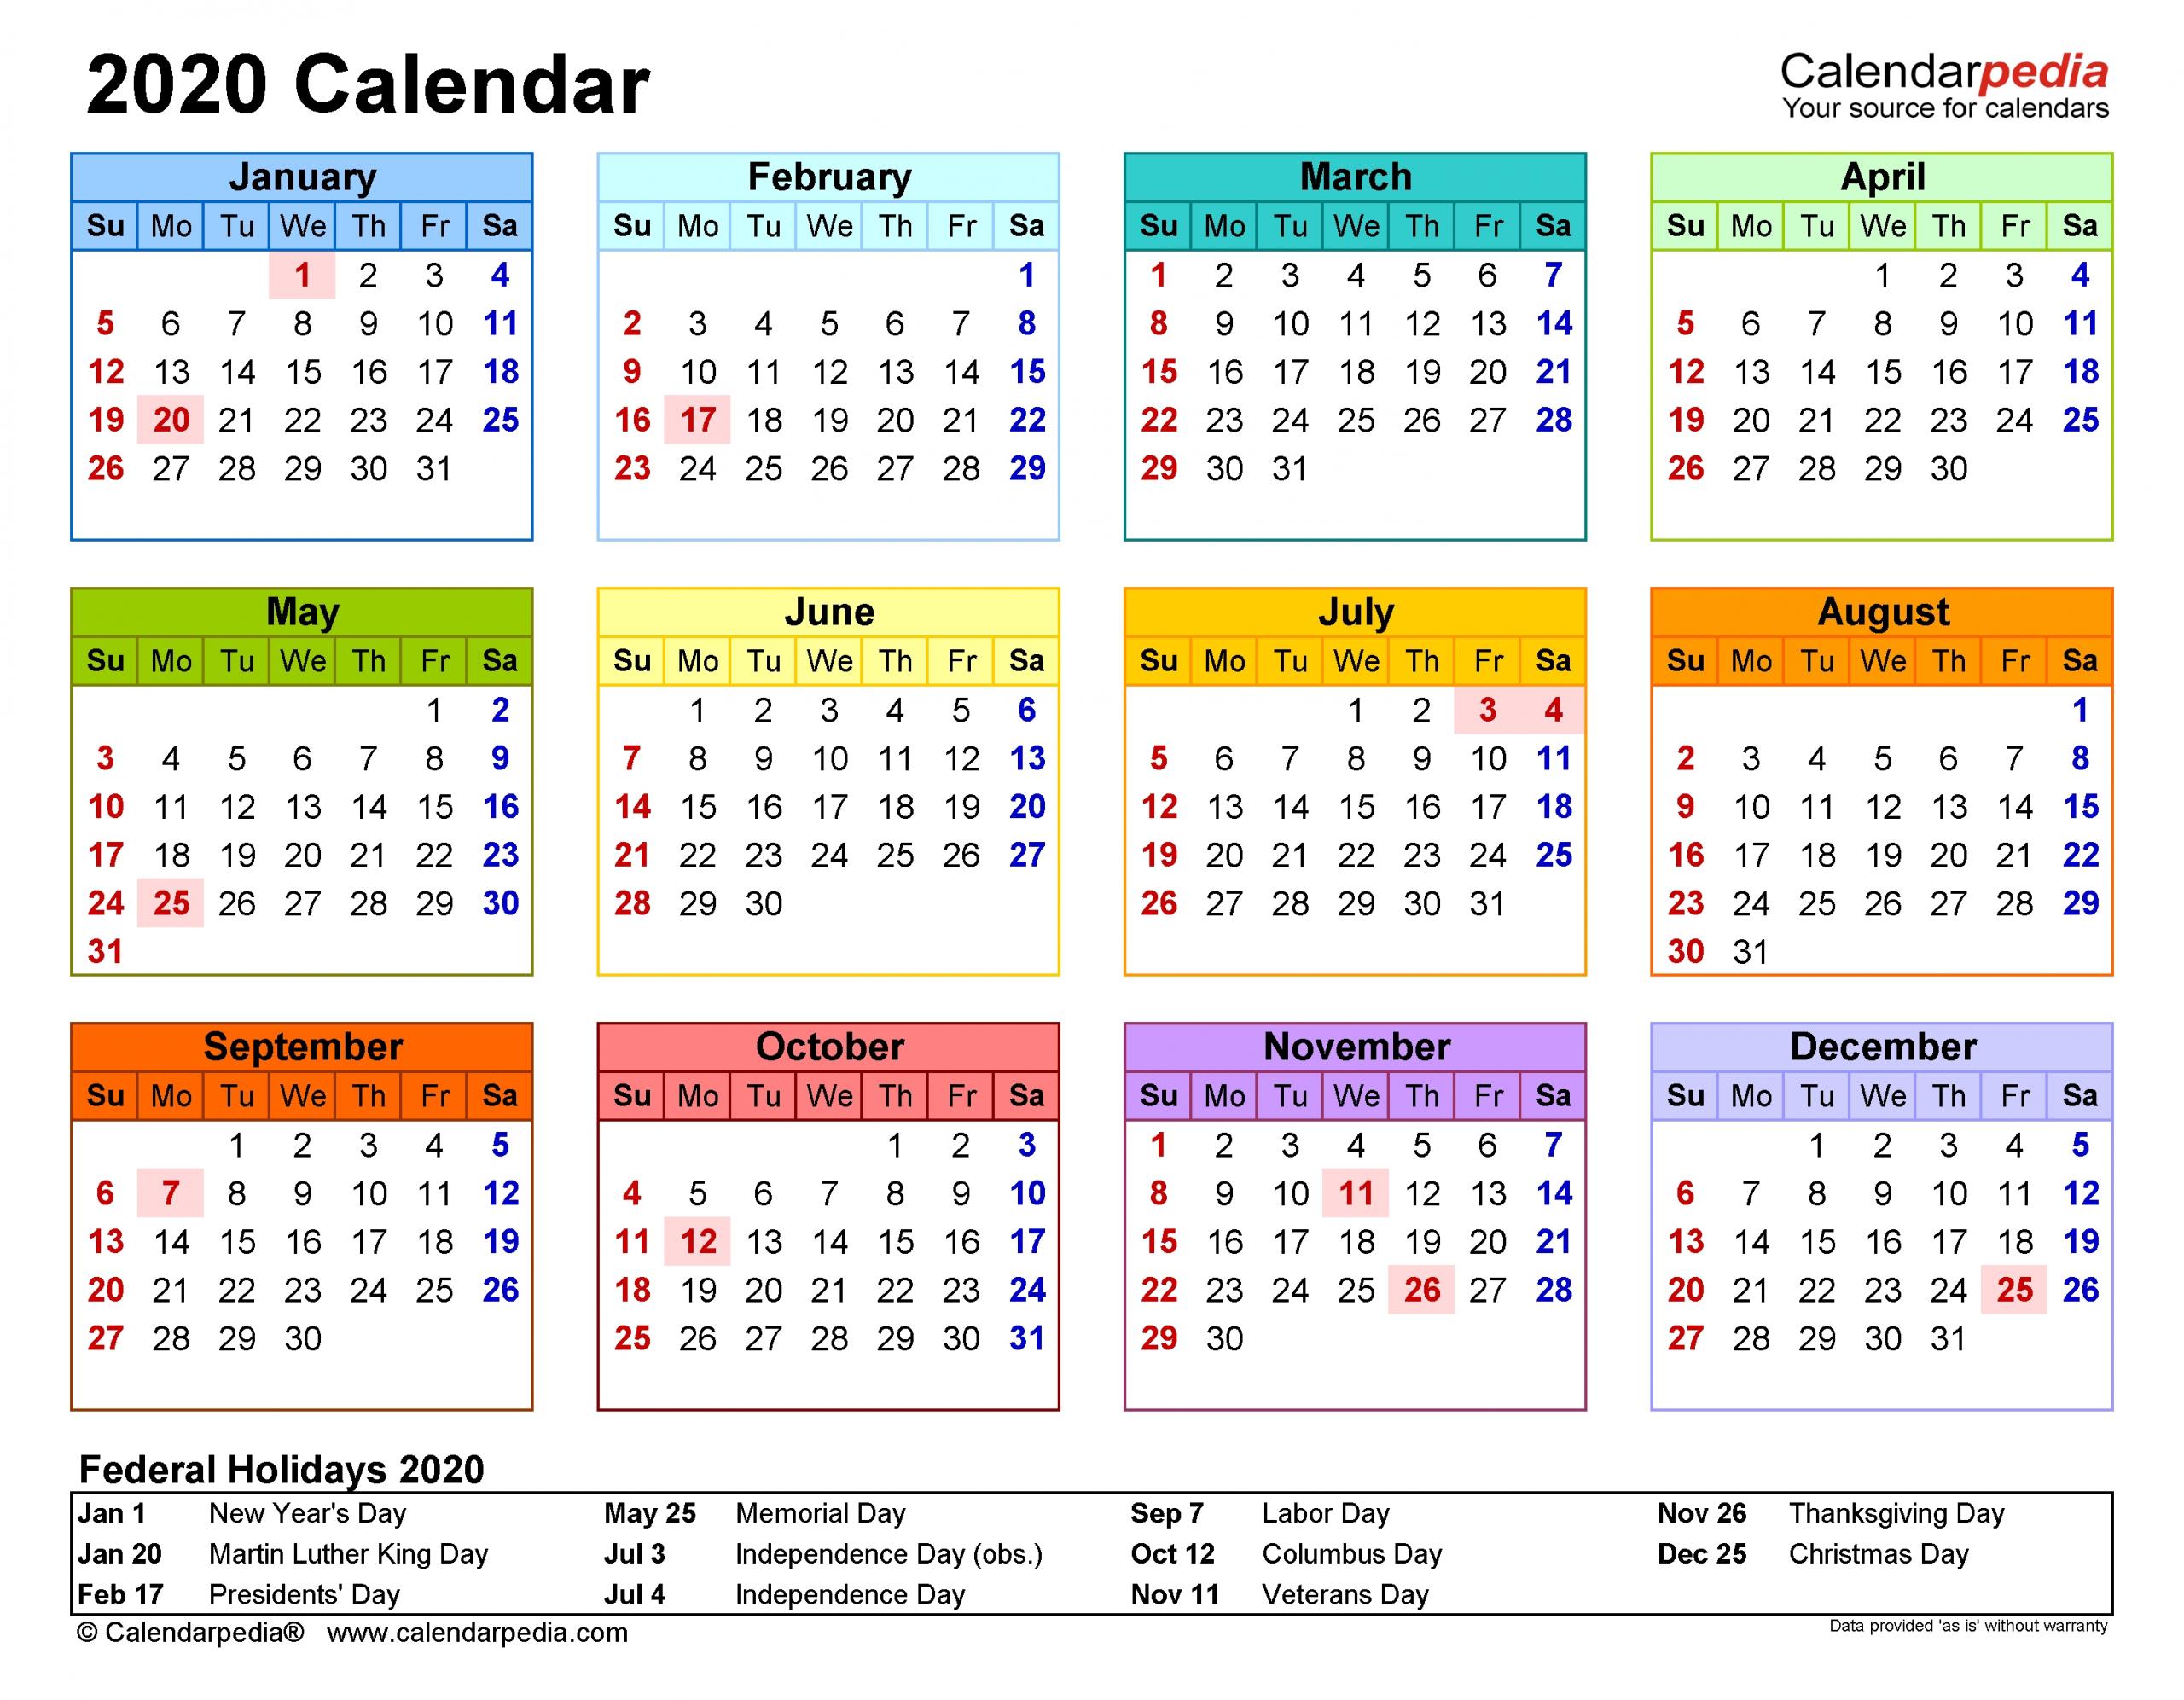 2020 Calendar - Free Printable Pdf Templates - Calendarpedia inside Print Pocket Size Calendar For 2020